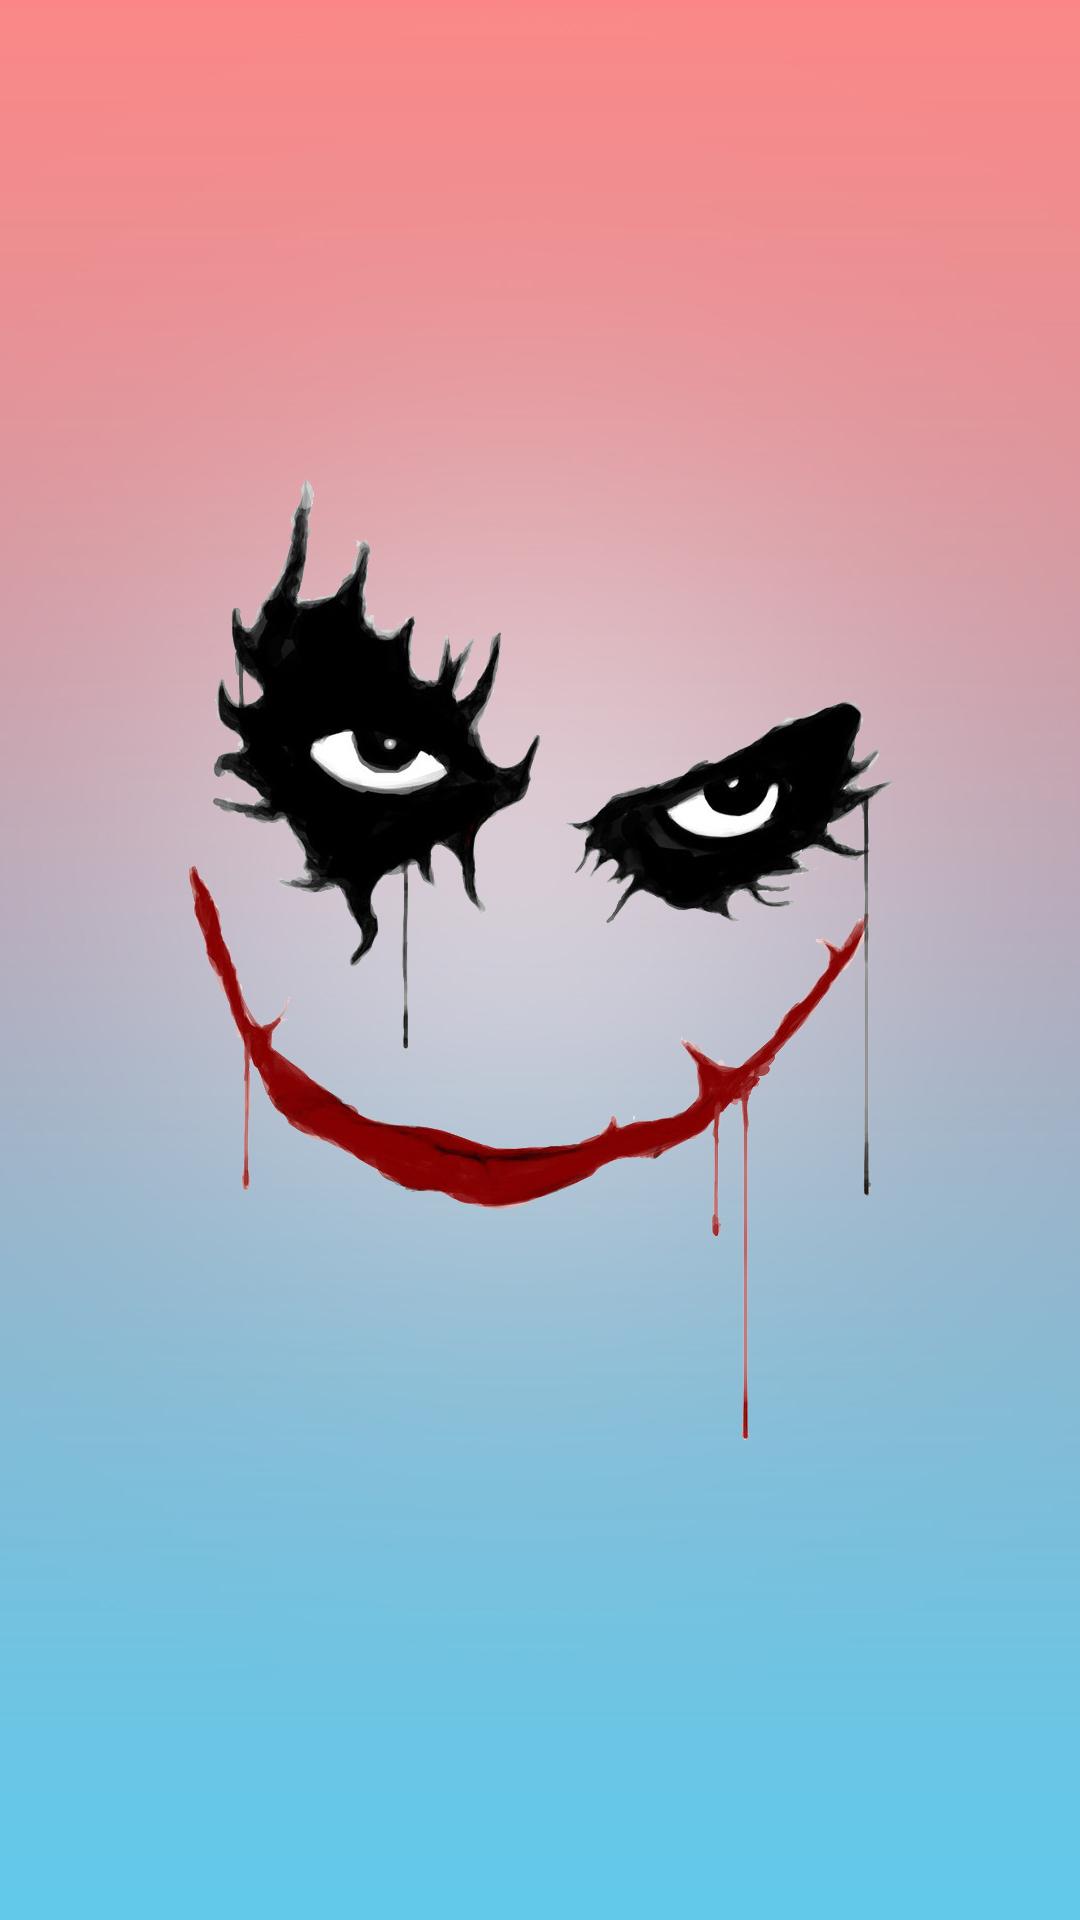 Joker Wallpaper iPhone 6S Plus by DeviantSith17 on DeviantArt